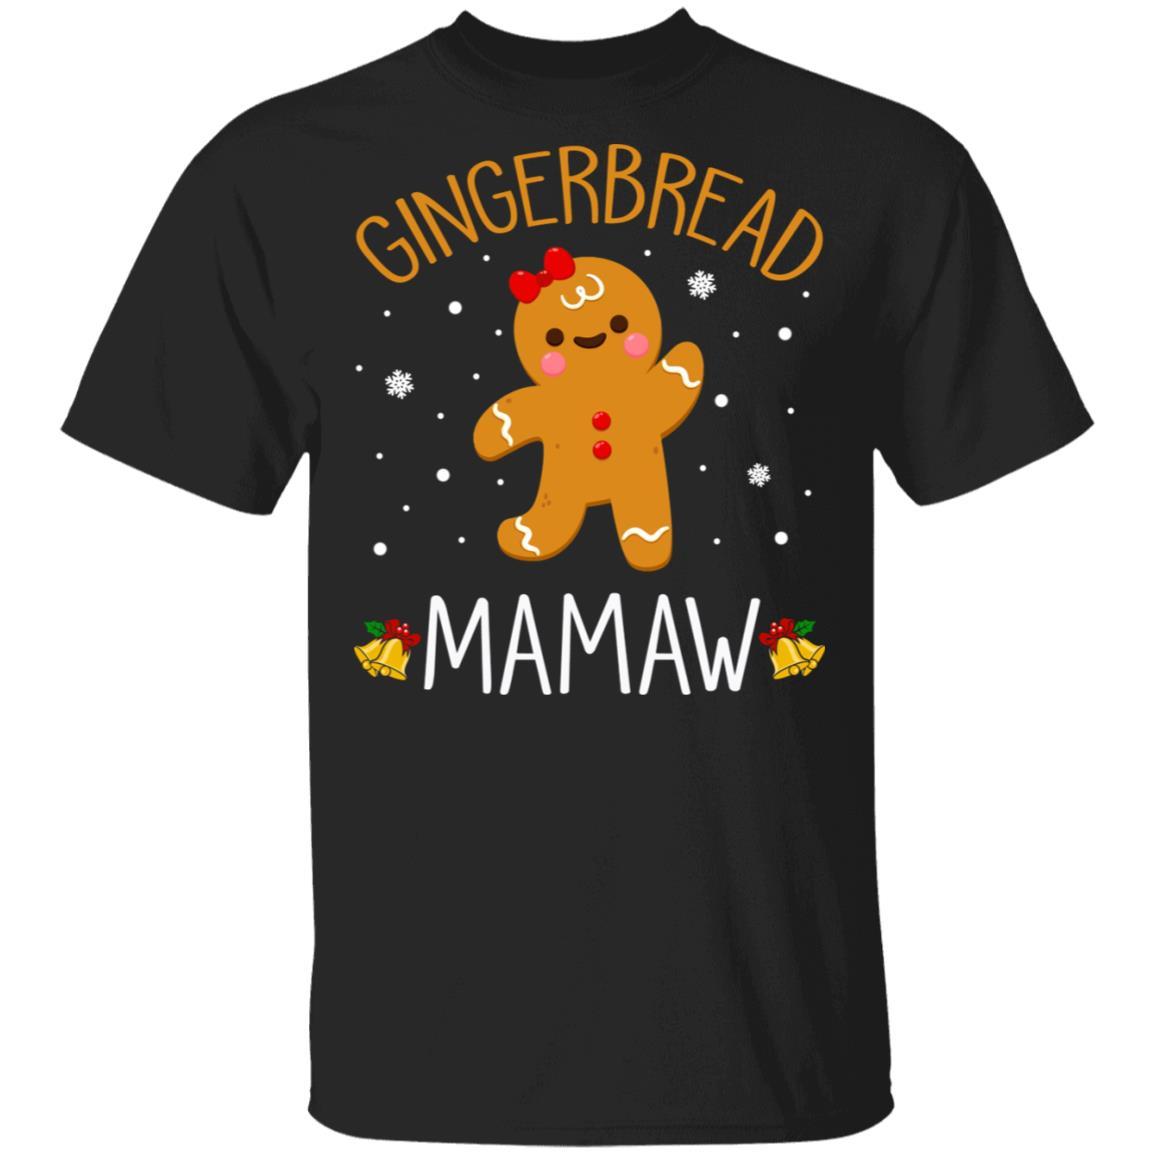 Xmas Cute Gingerbread Men Mamaw Christmas Family Unisex Short Sleeve